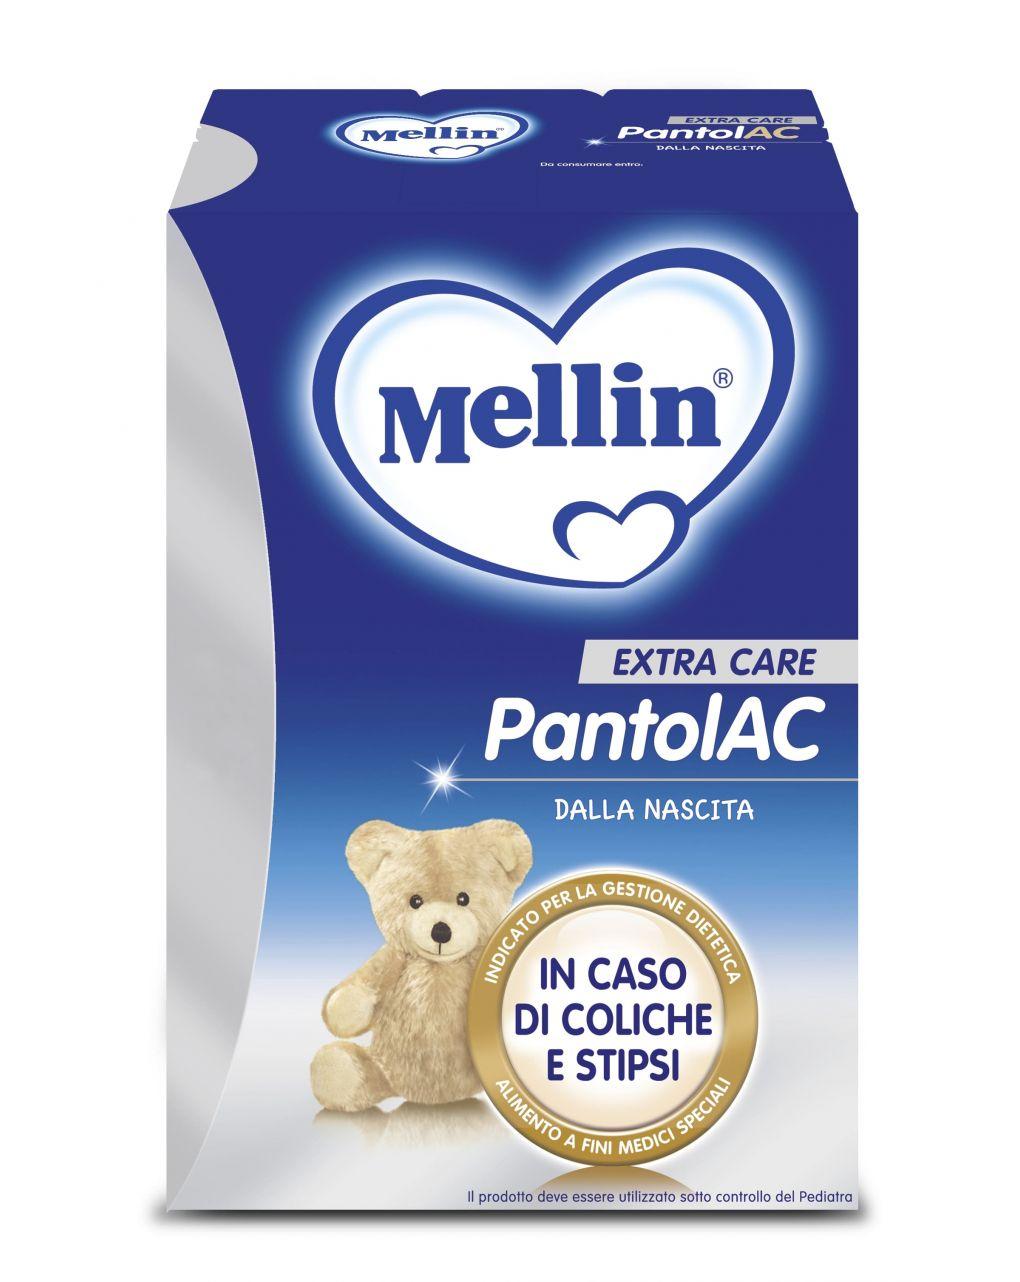 Mellin - latte pantolac polvere 600g - Mellin